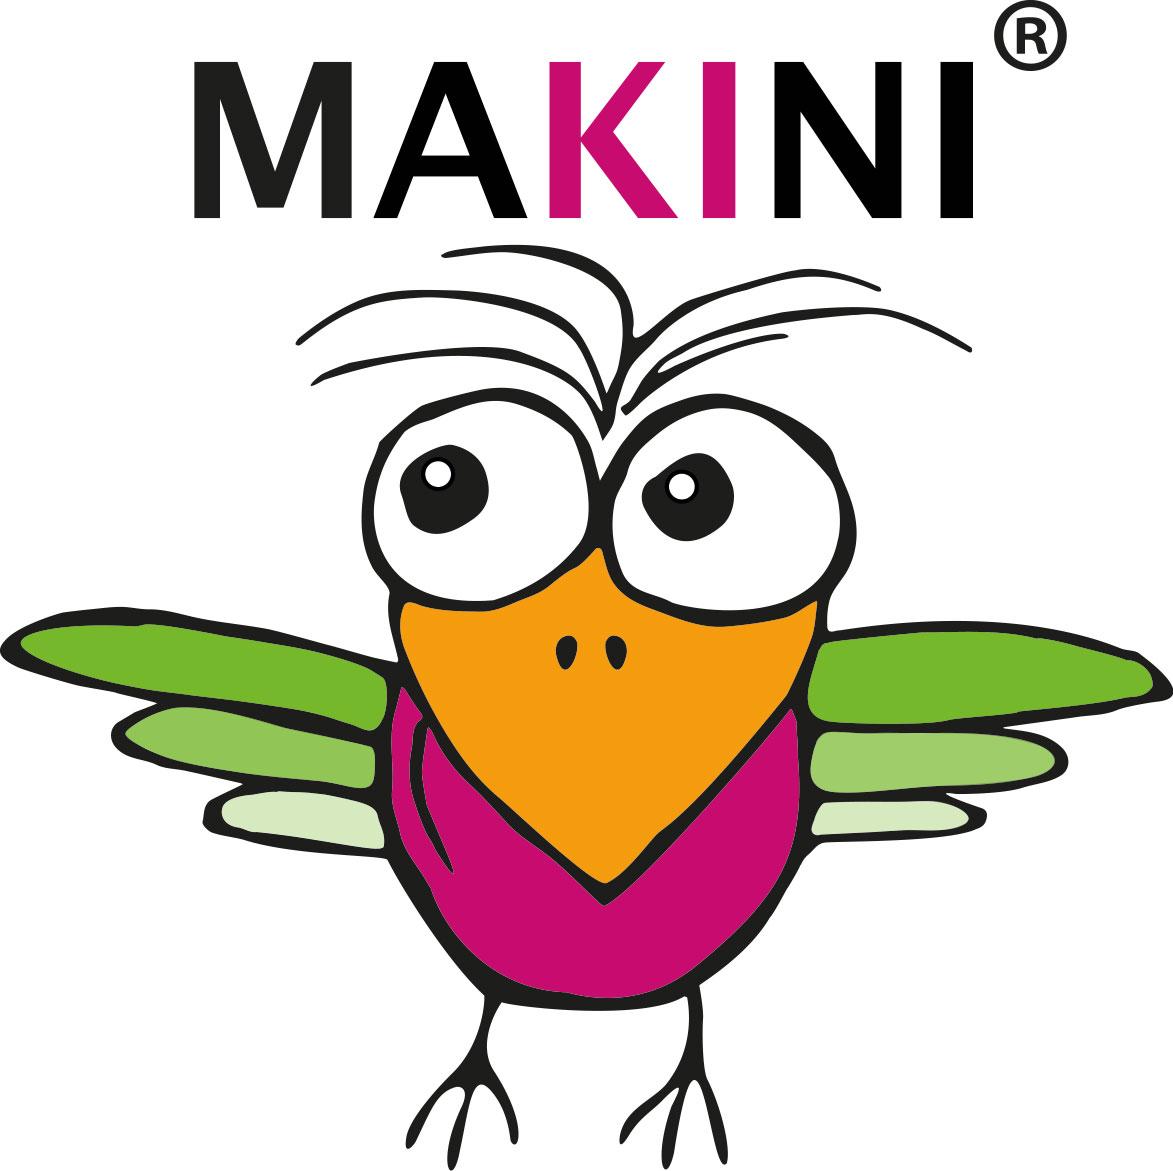 greenfietsen bei MAKINI